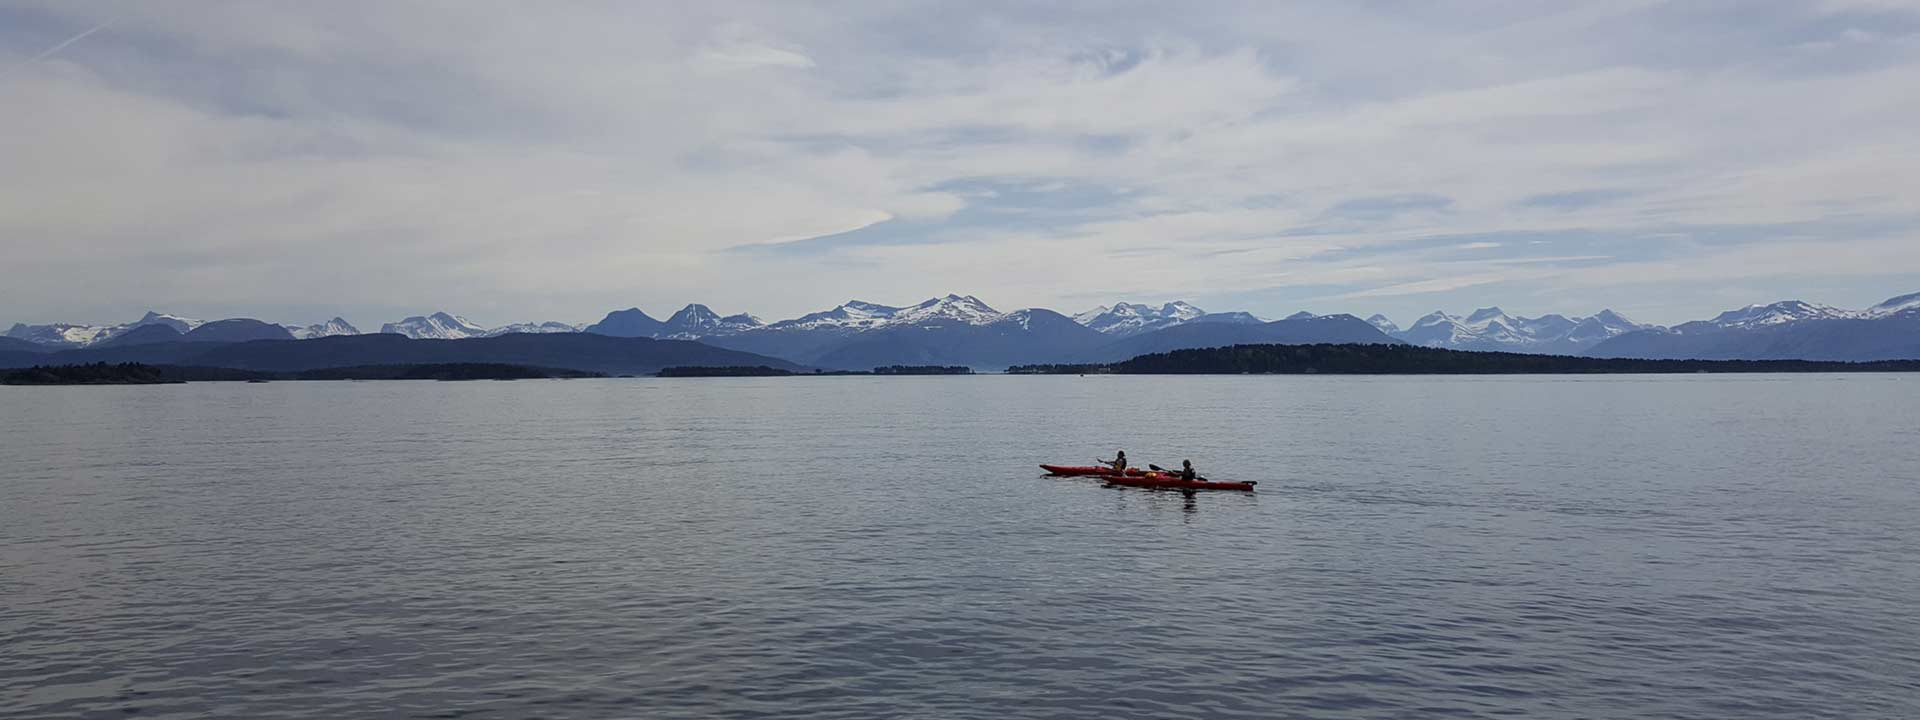 Kayak fjord norway - SEO header